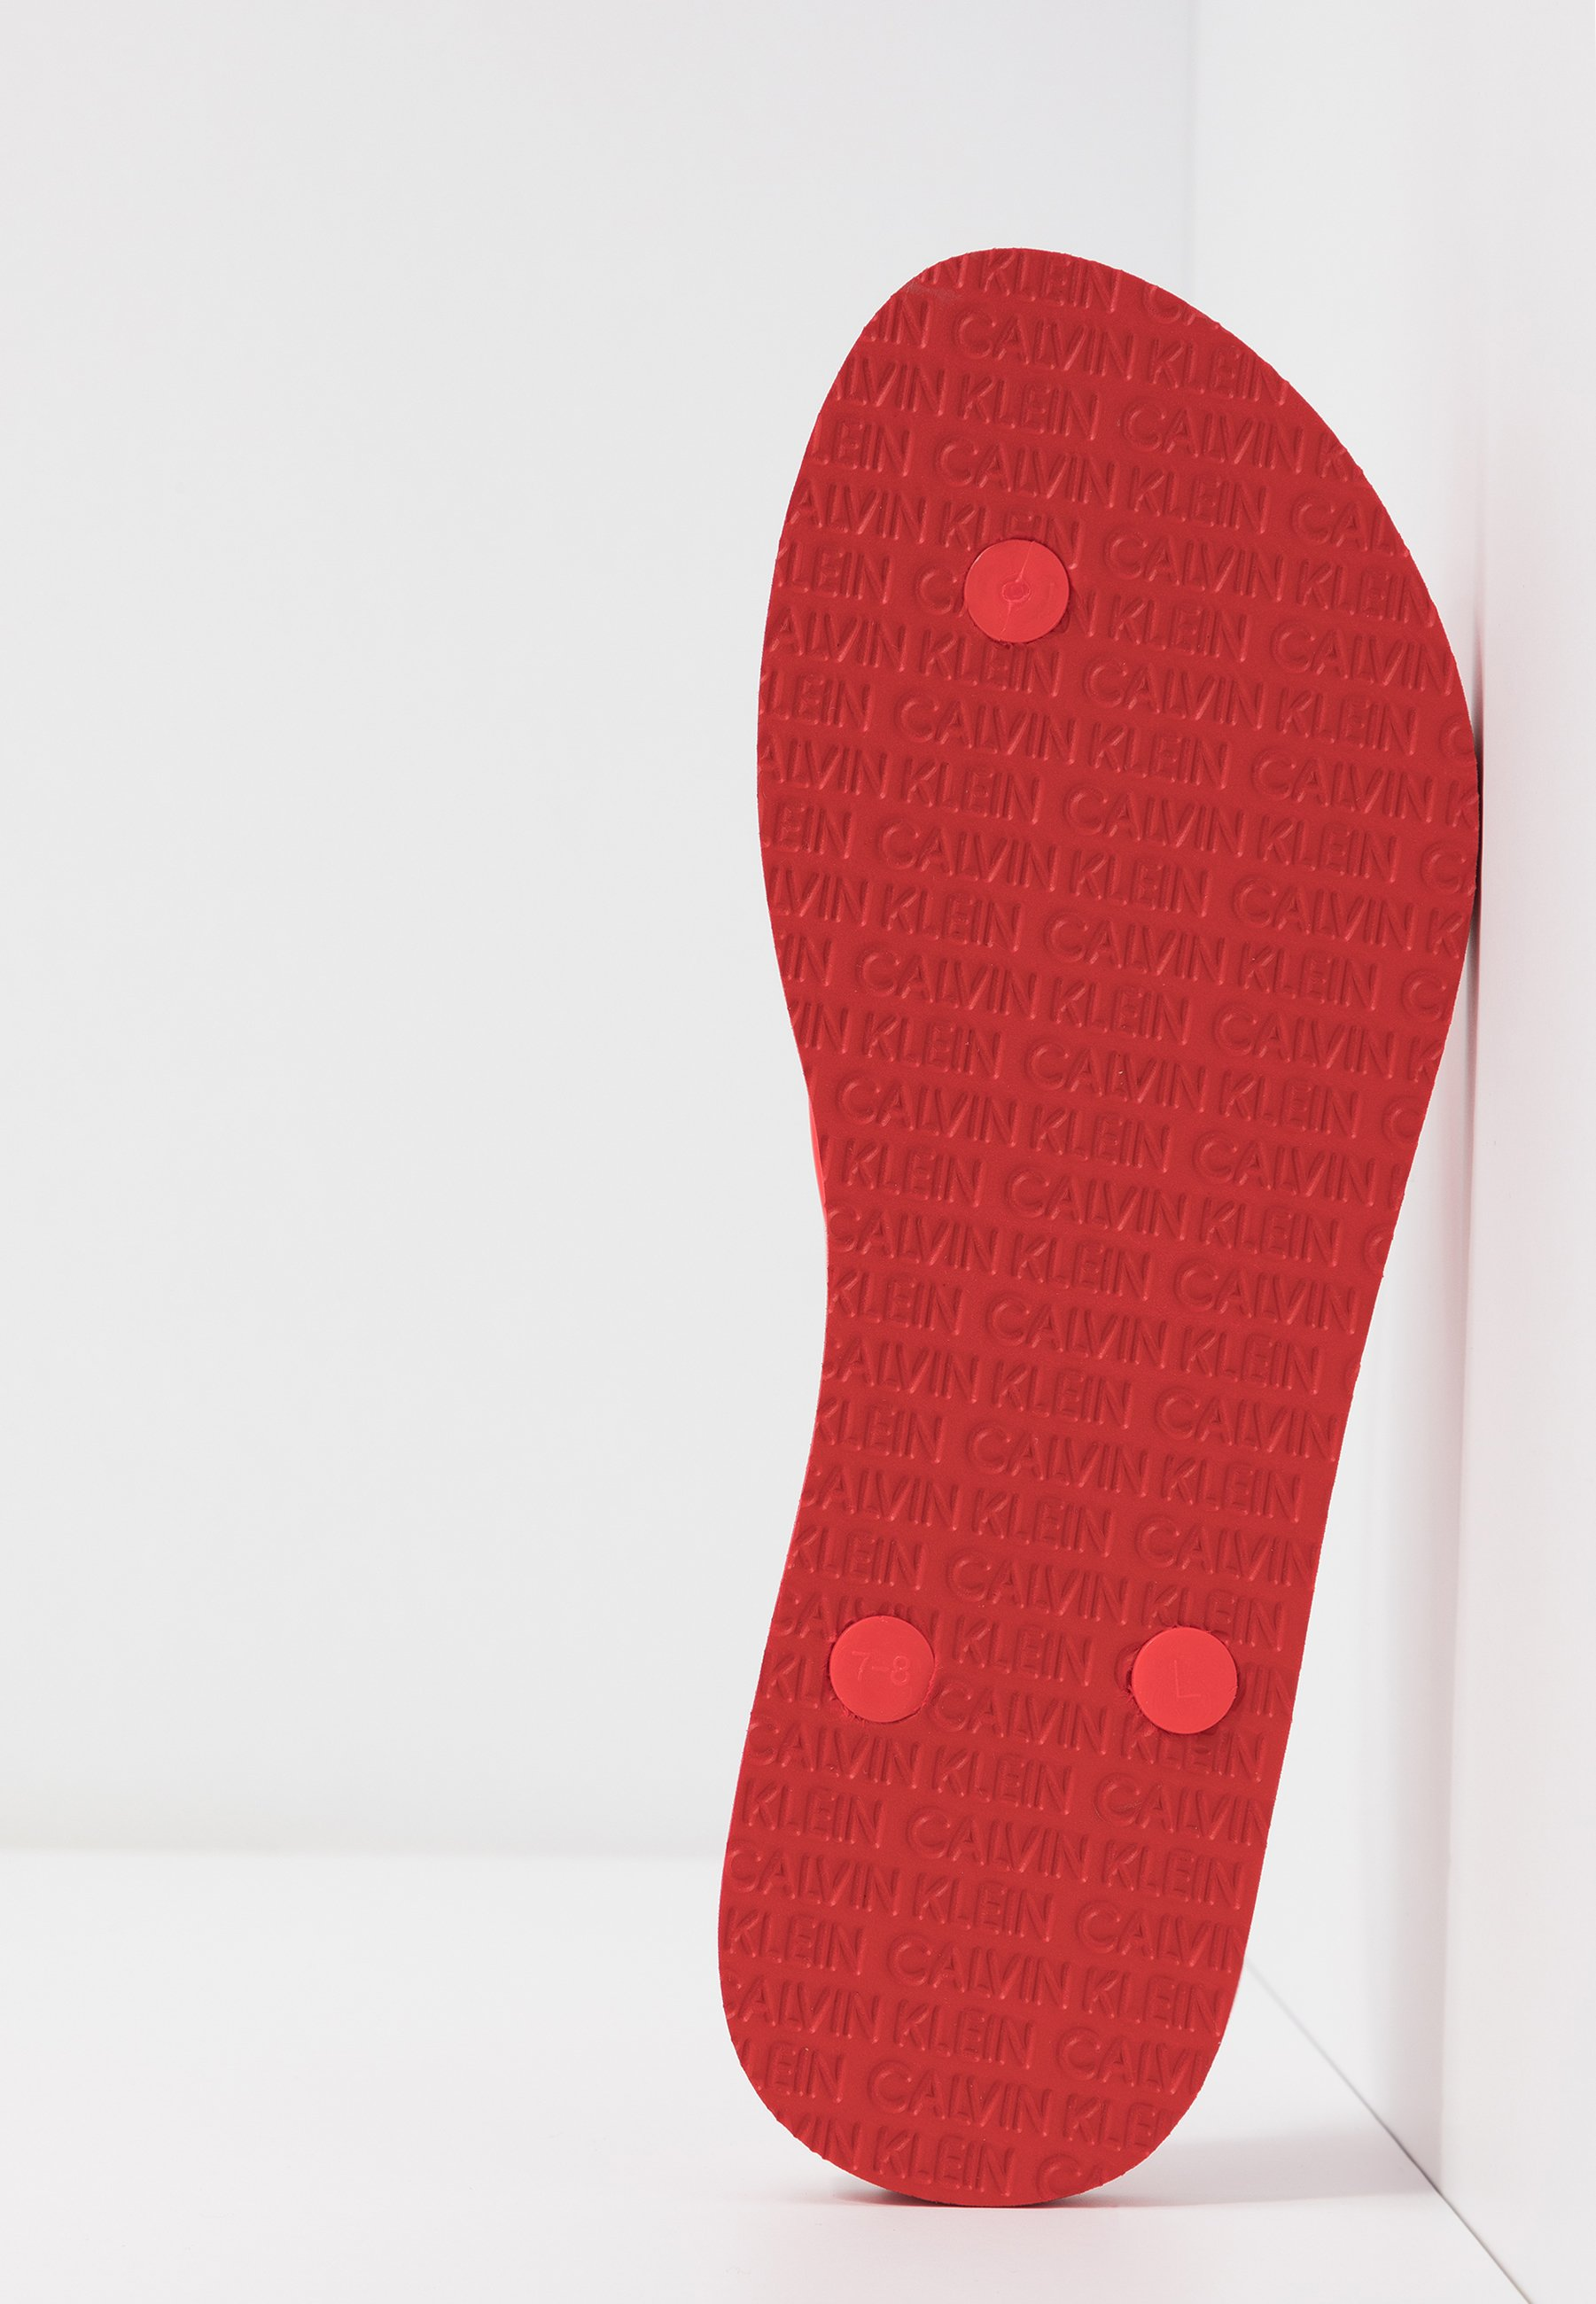 Calvin Klein Swimwear Klipklappere/ klip klapper - high risk